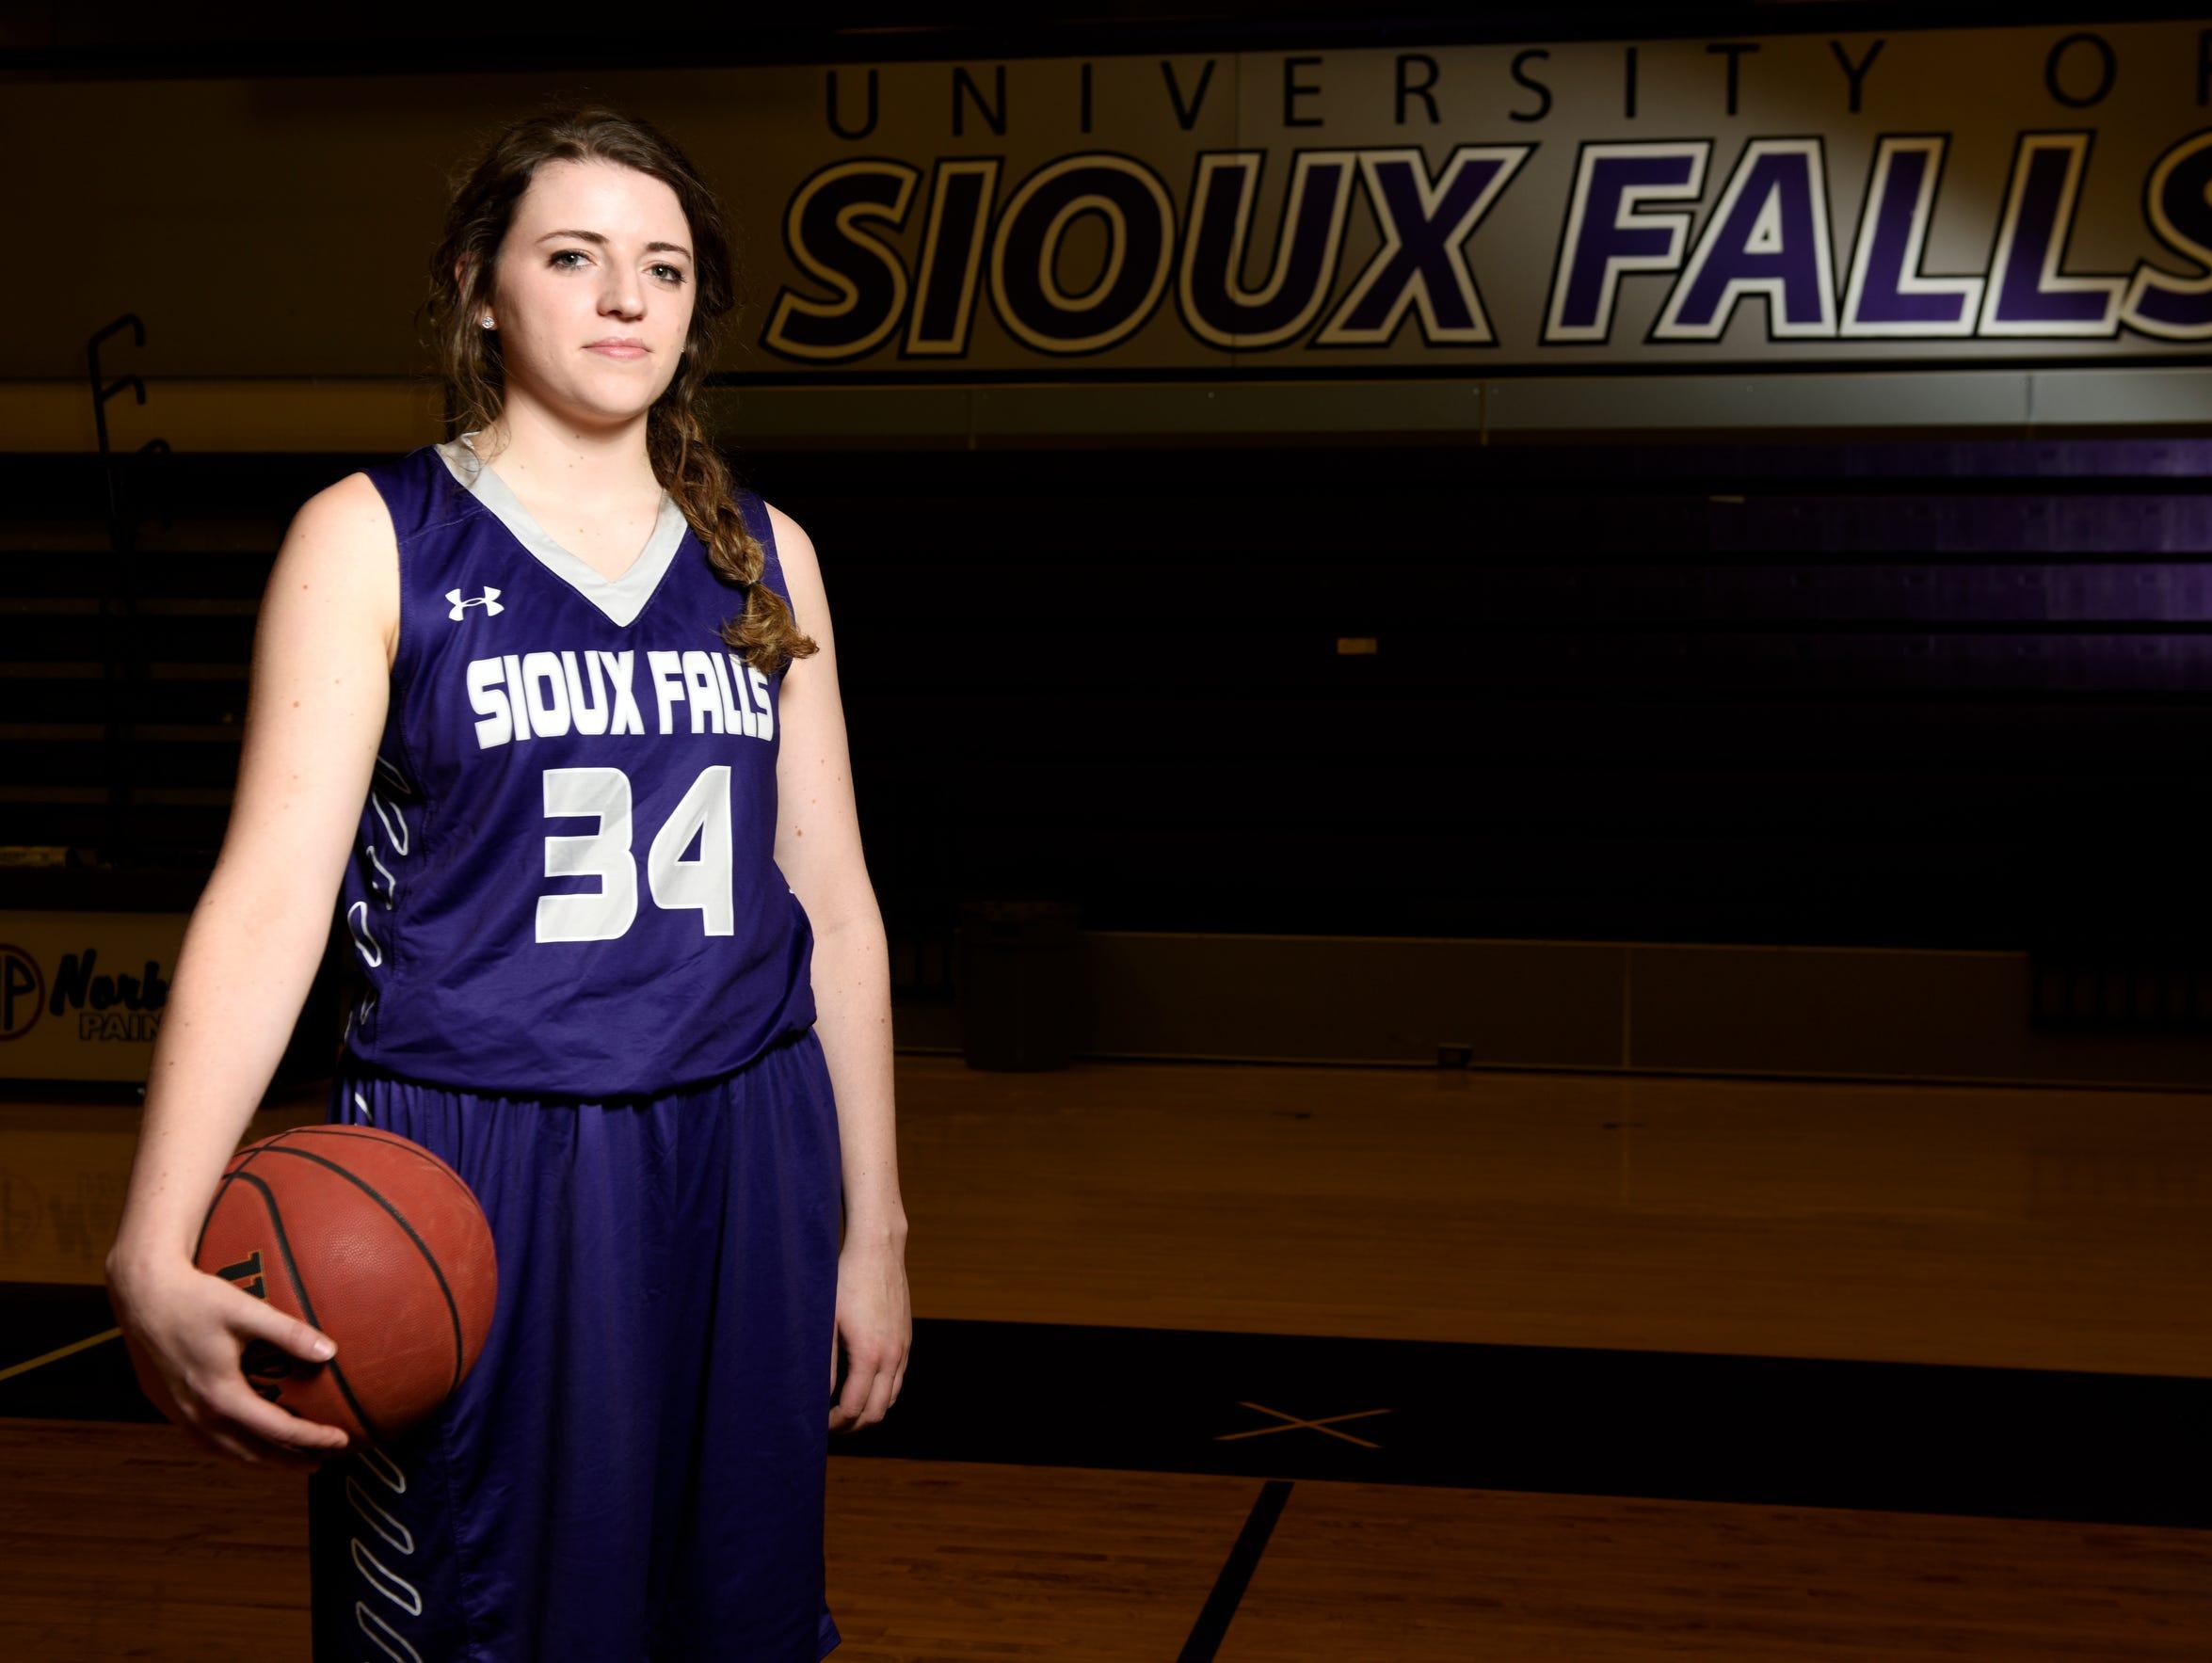 University of Sioux Falls forward Moira Duffy poses